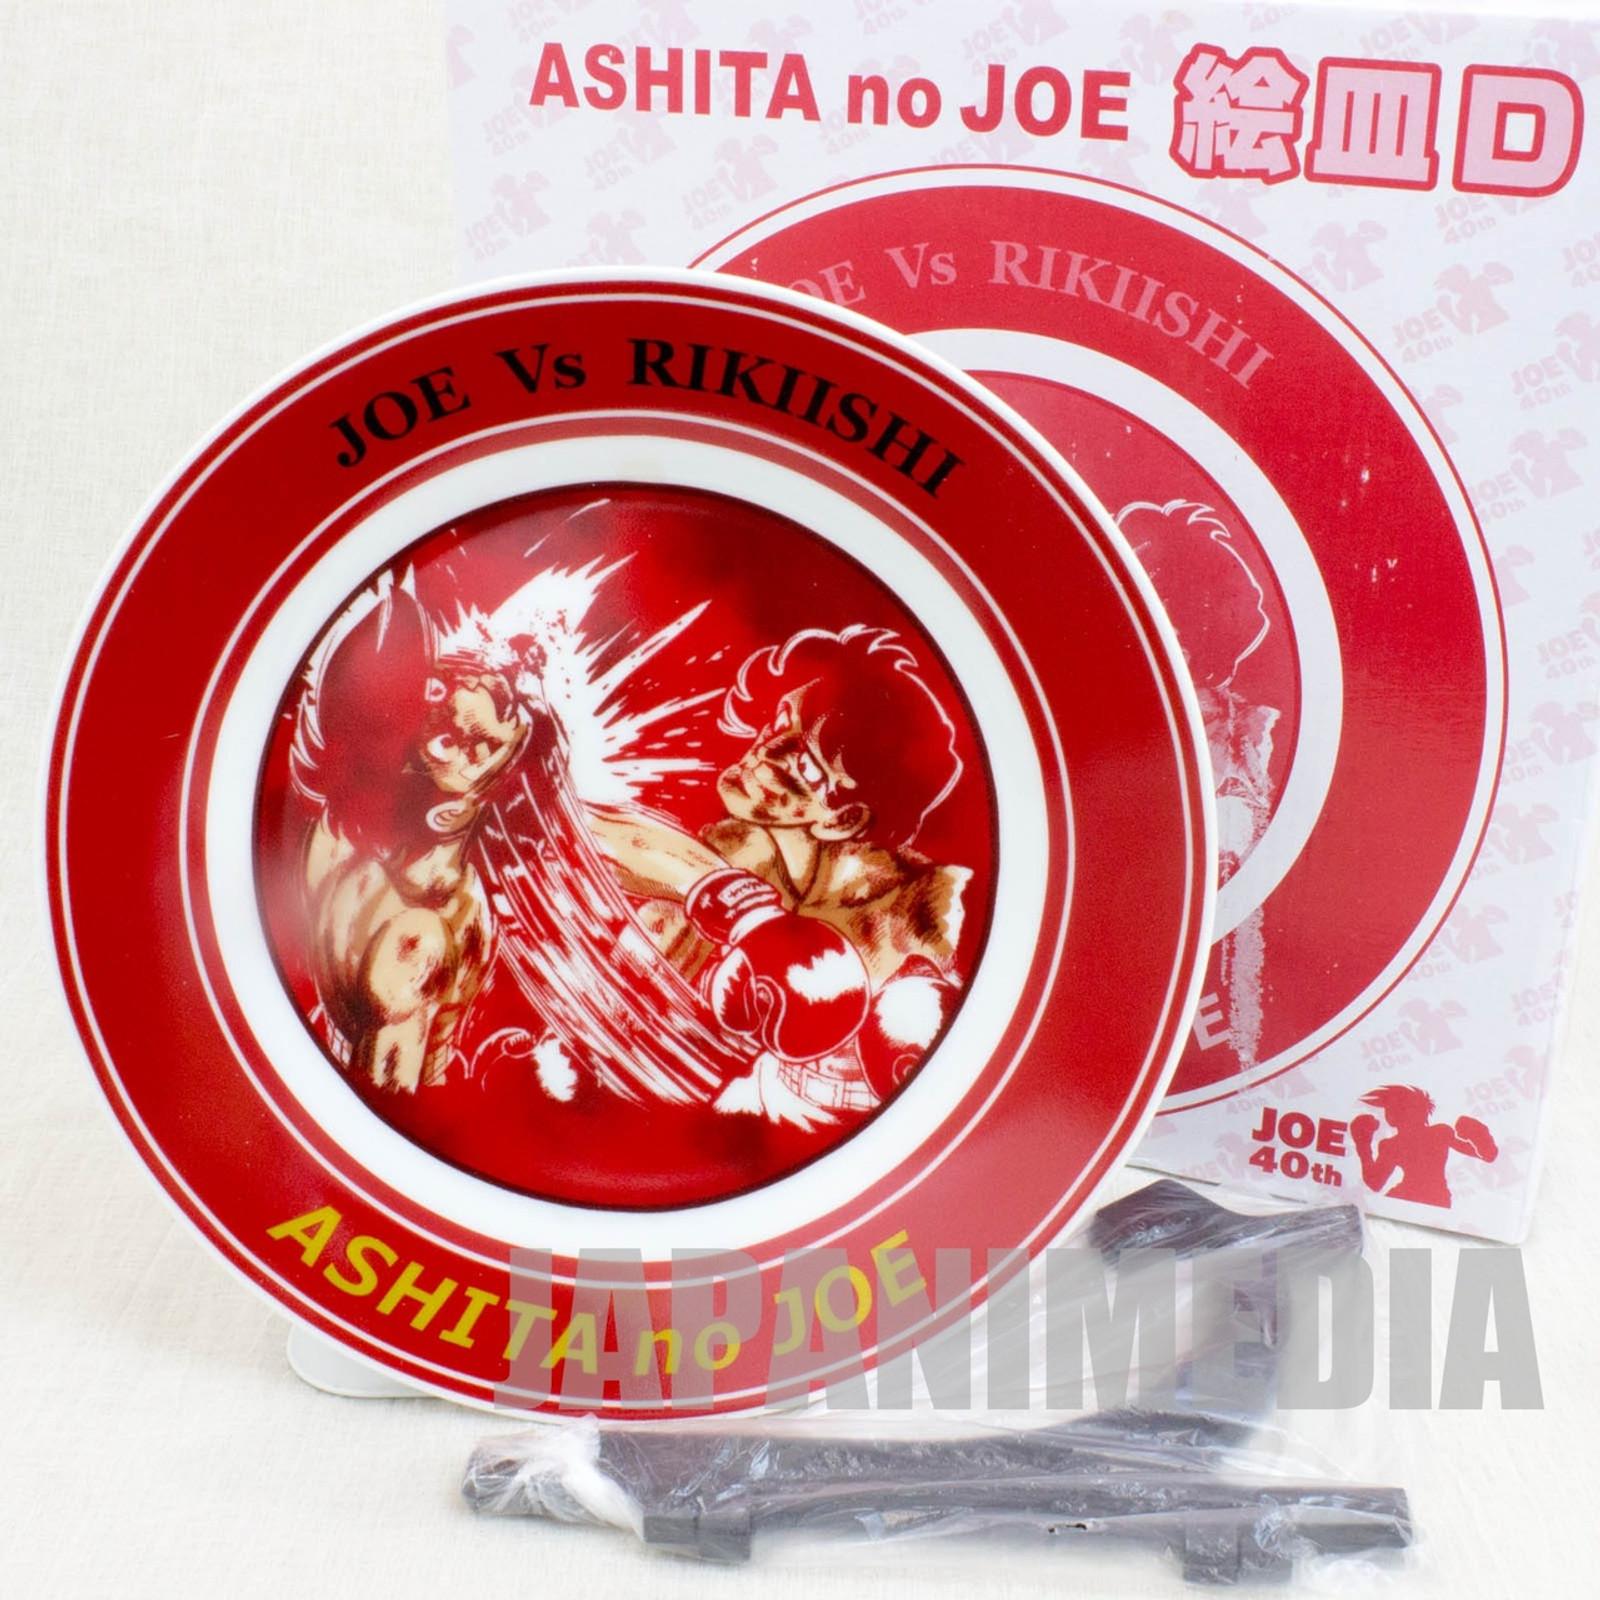 Ashita no Joe ROKIISHI Picture Dish JOE 40th Anniversary JAPAN ANIME MANGA